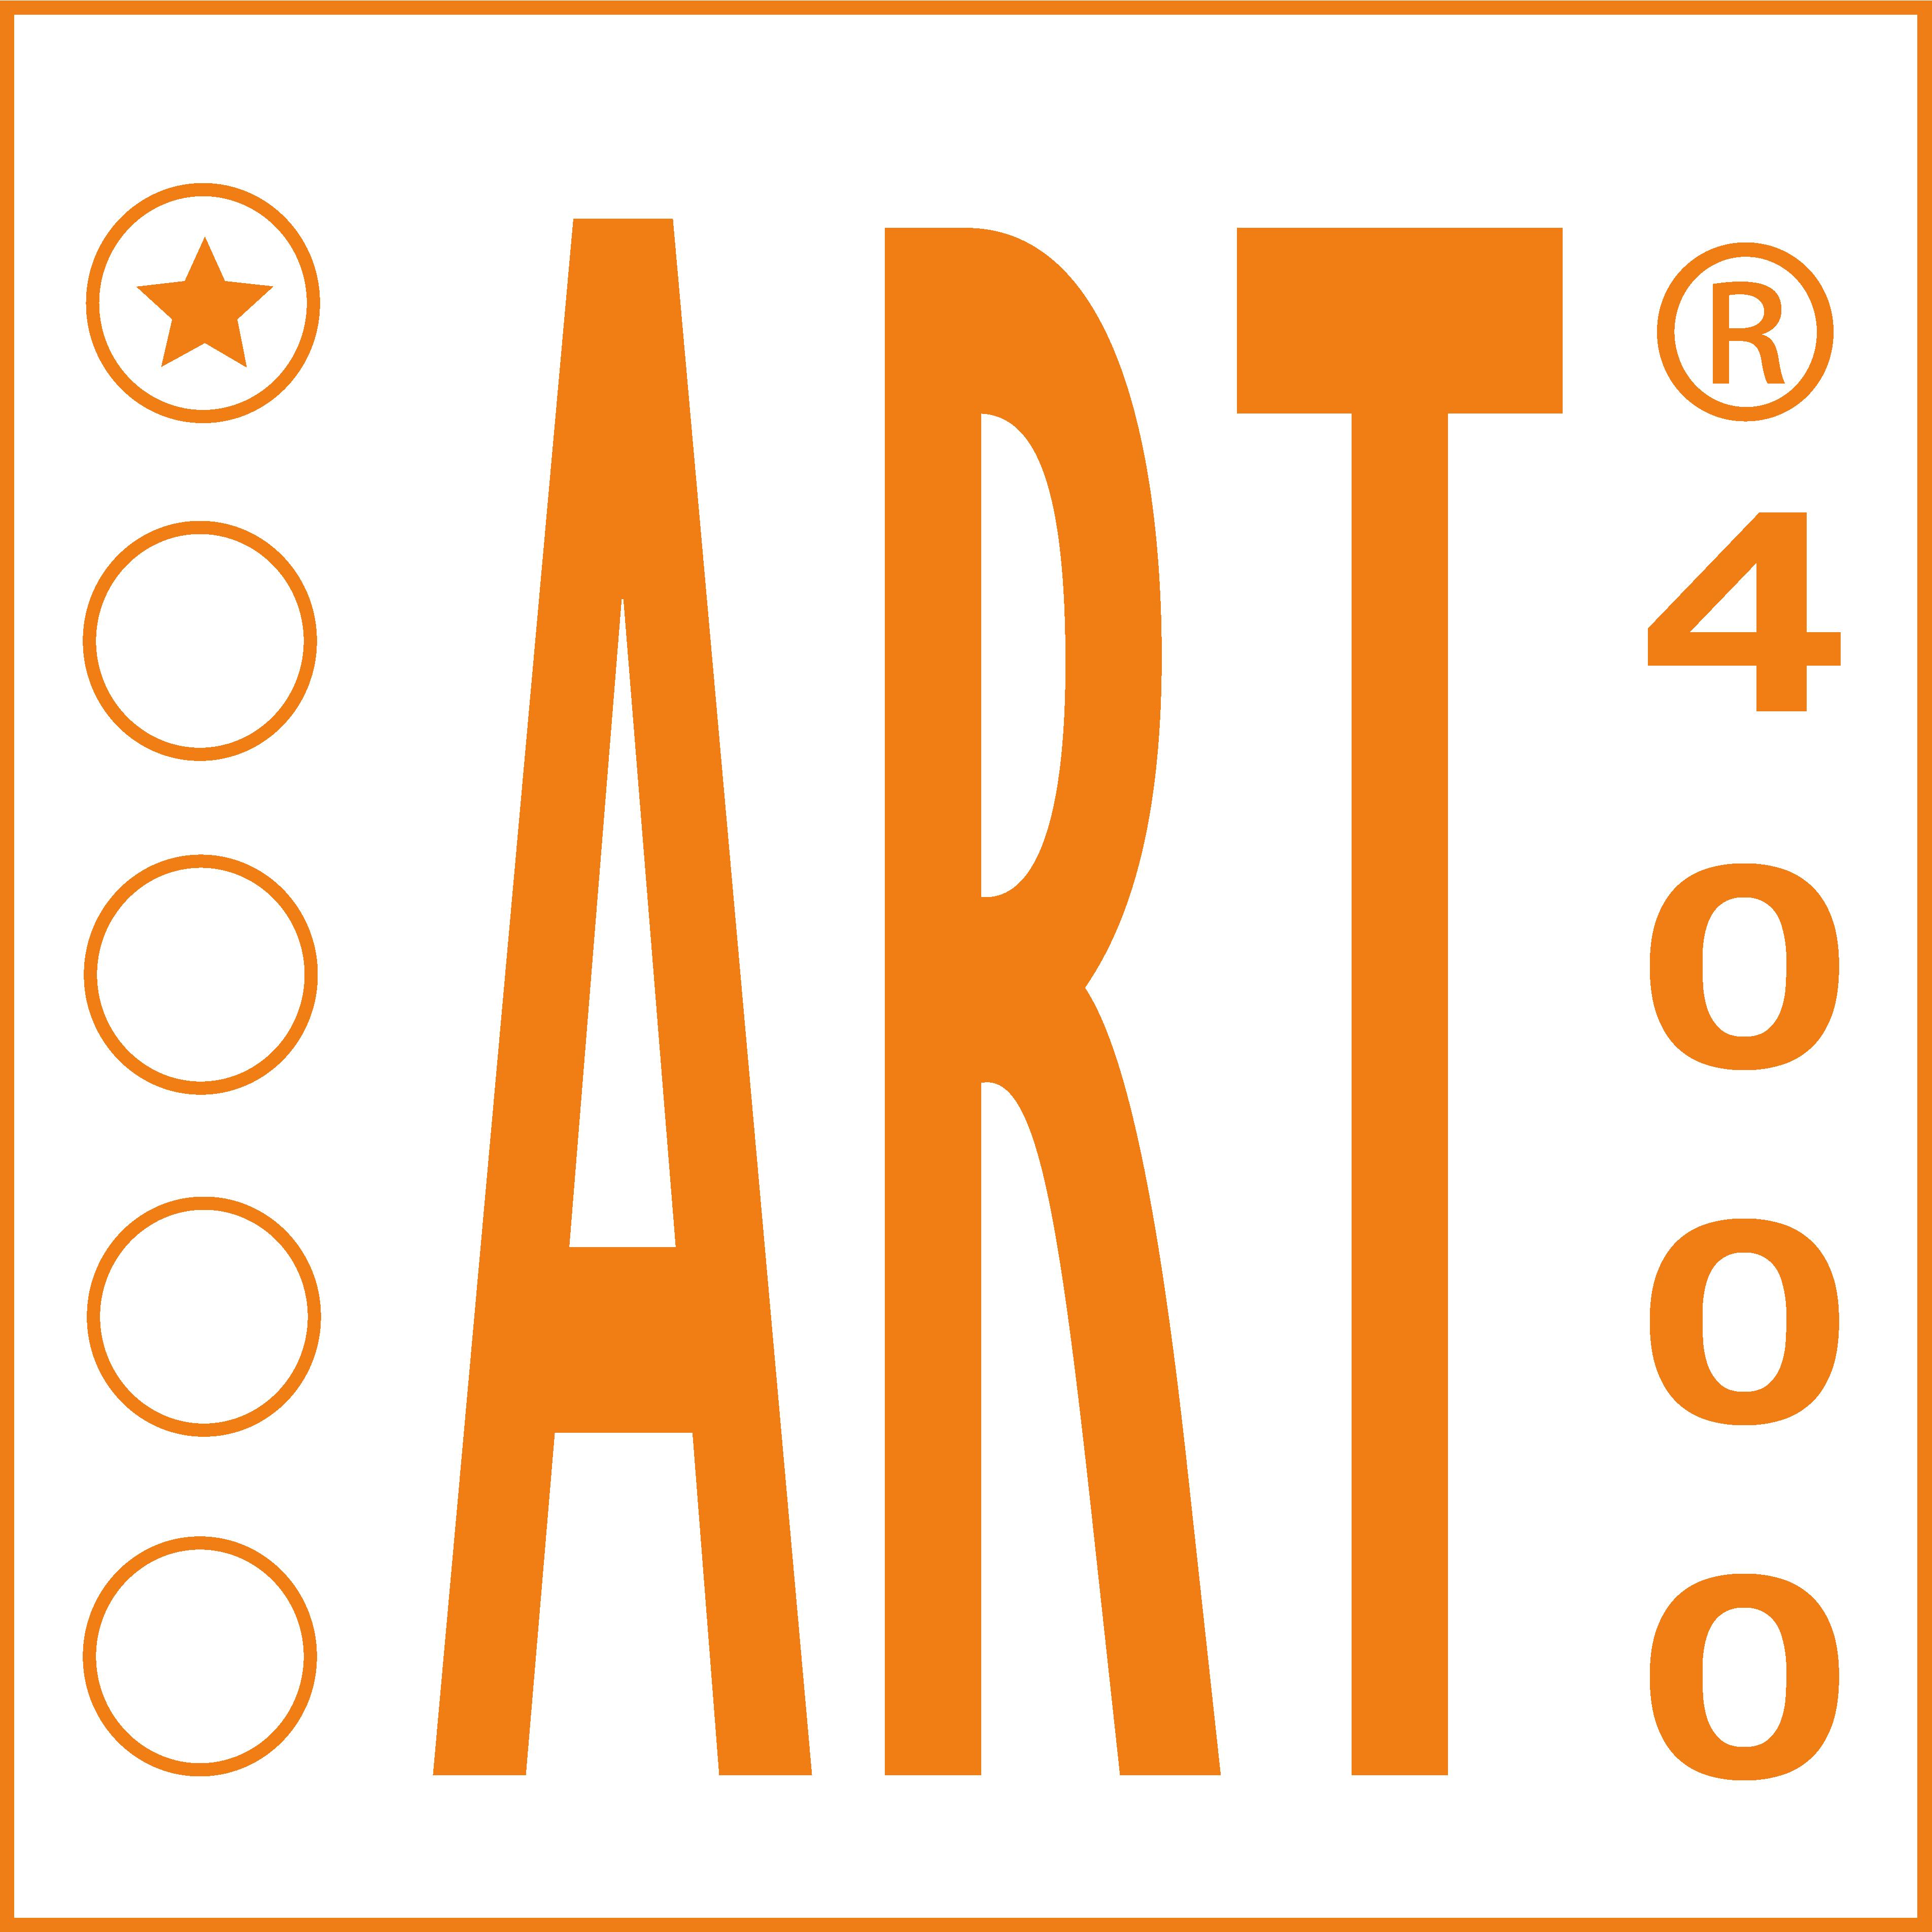 Vinz Kibo Kabelslot ART & VBV - 5 Meter